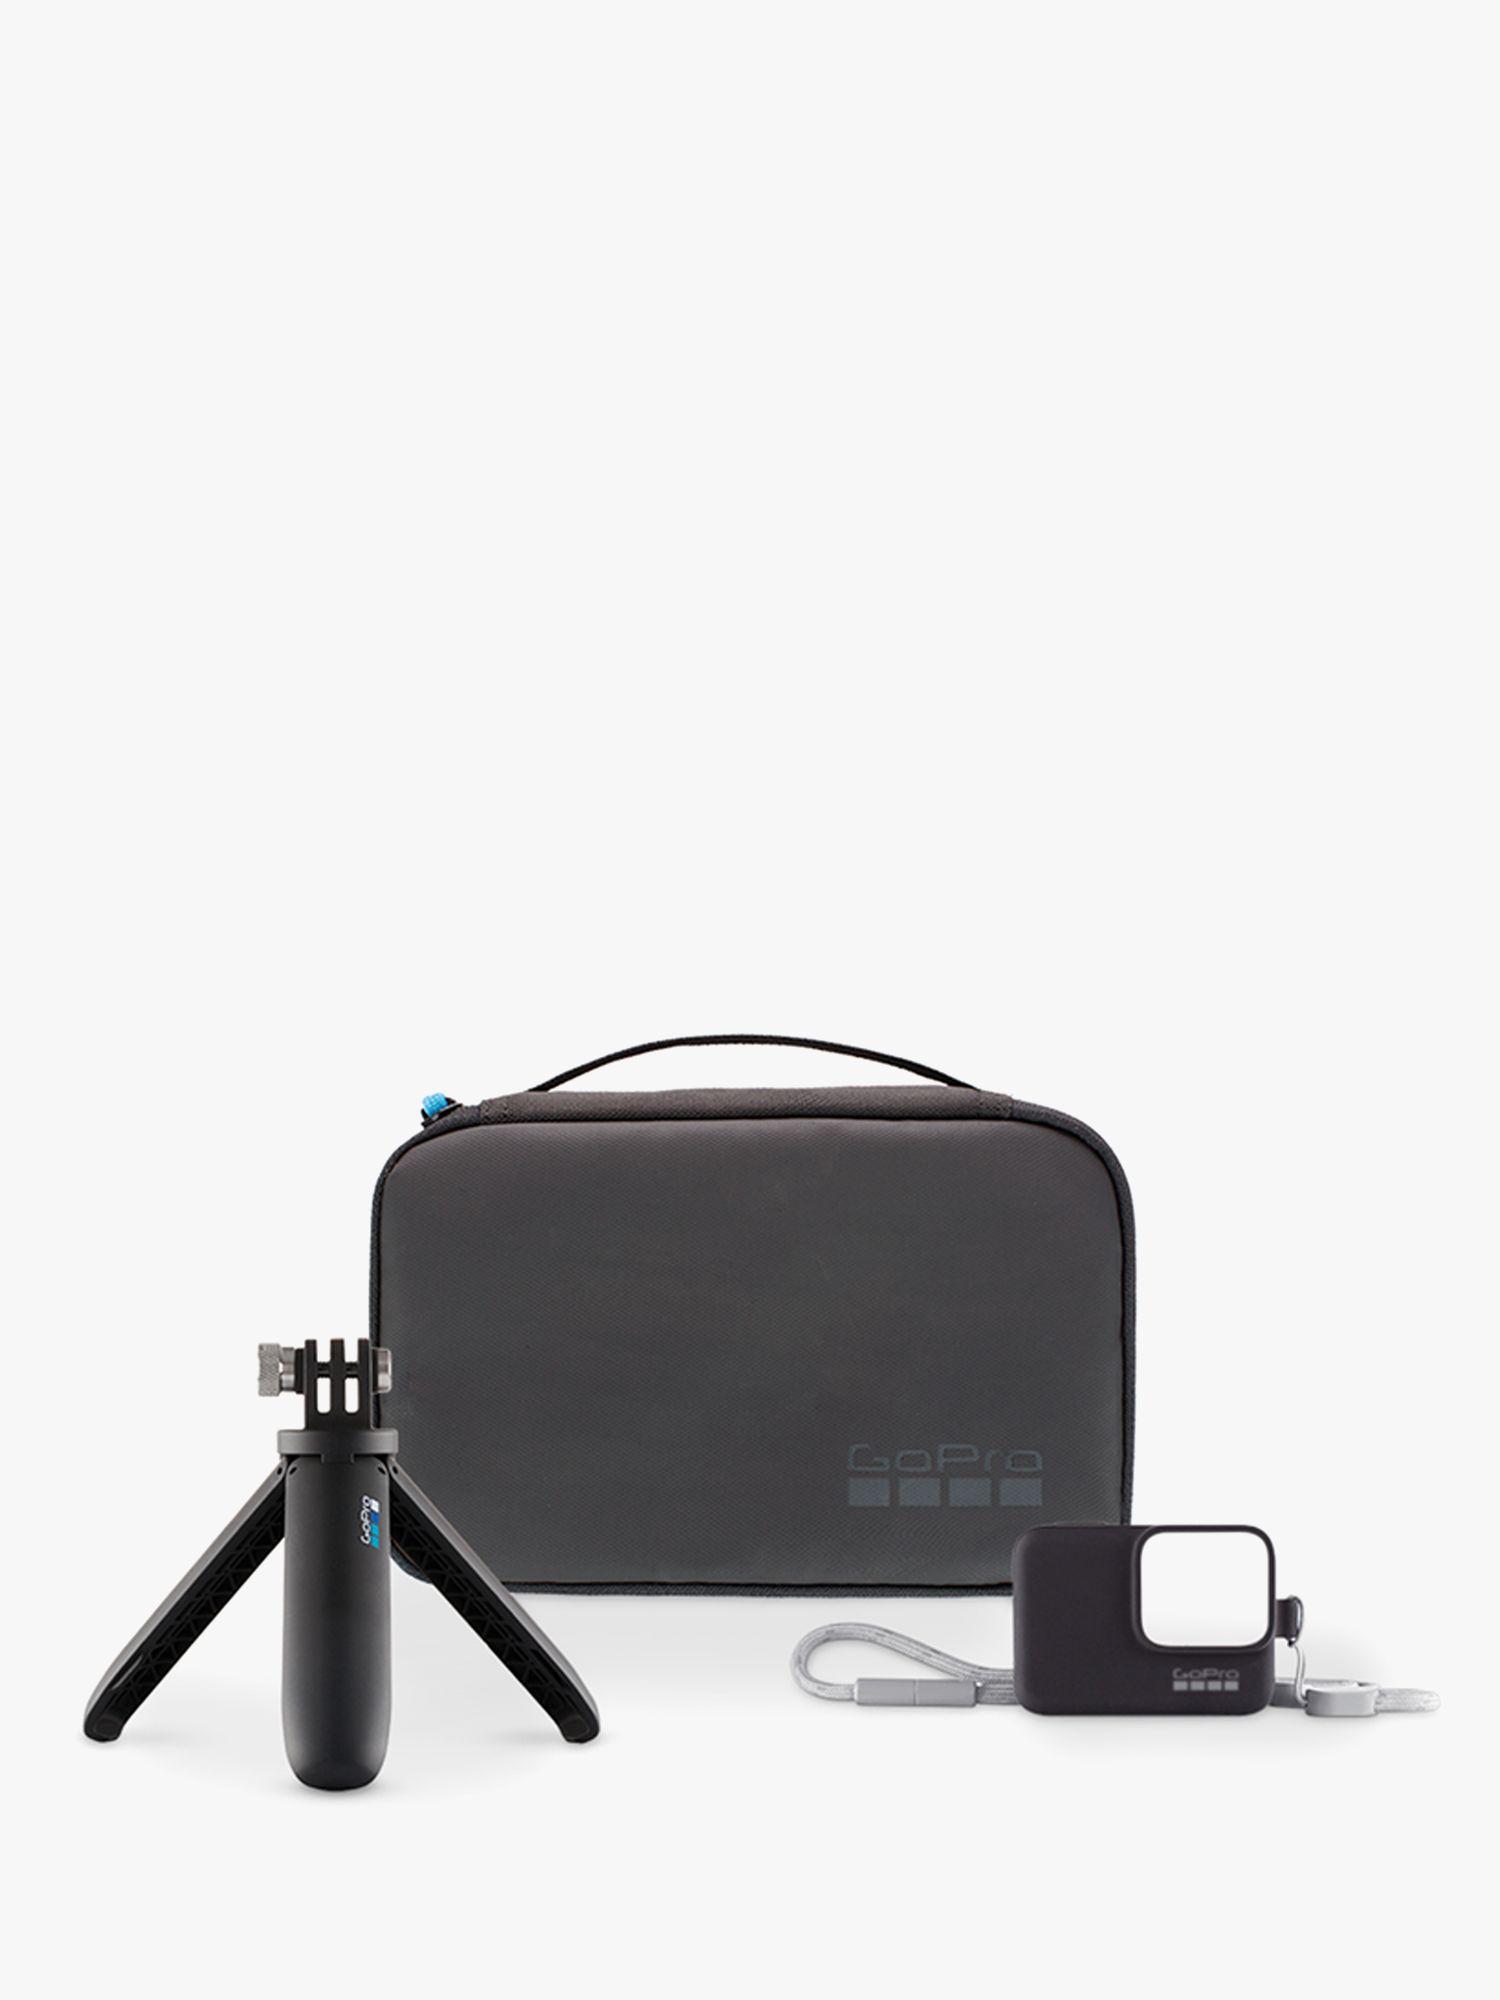 GoPro Travel Kit, GoPro Shorty Mini-Extending Tripod, Lanyard and Case Bundle